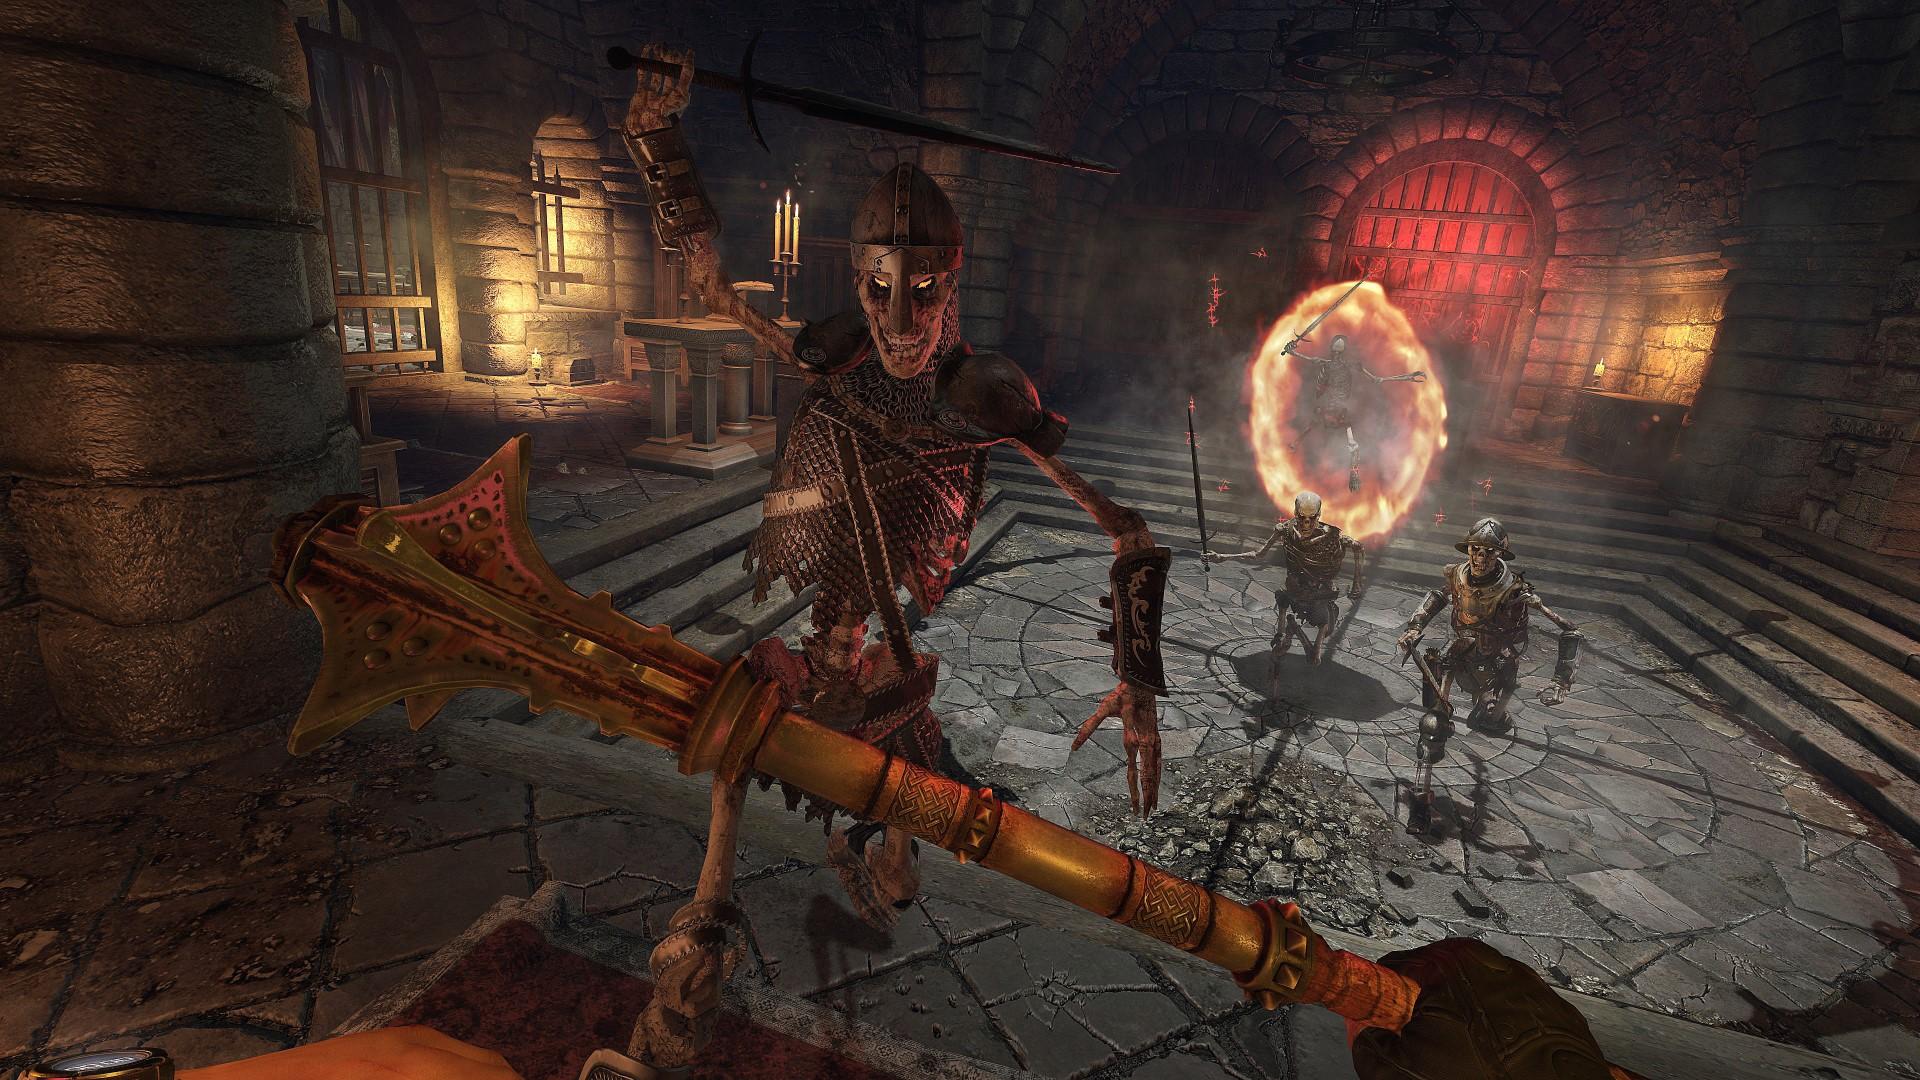 Dying Light's weird Hellraid DLC now has a story mode